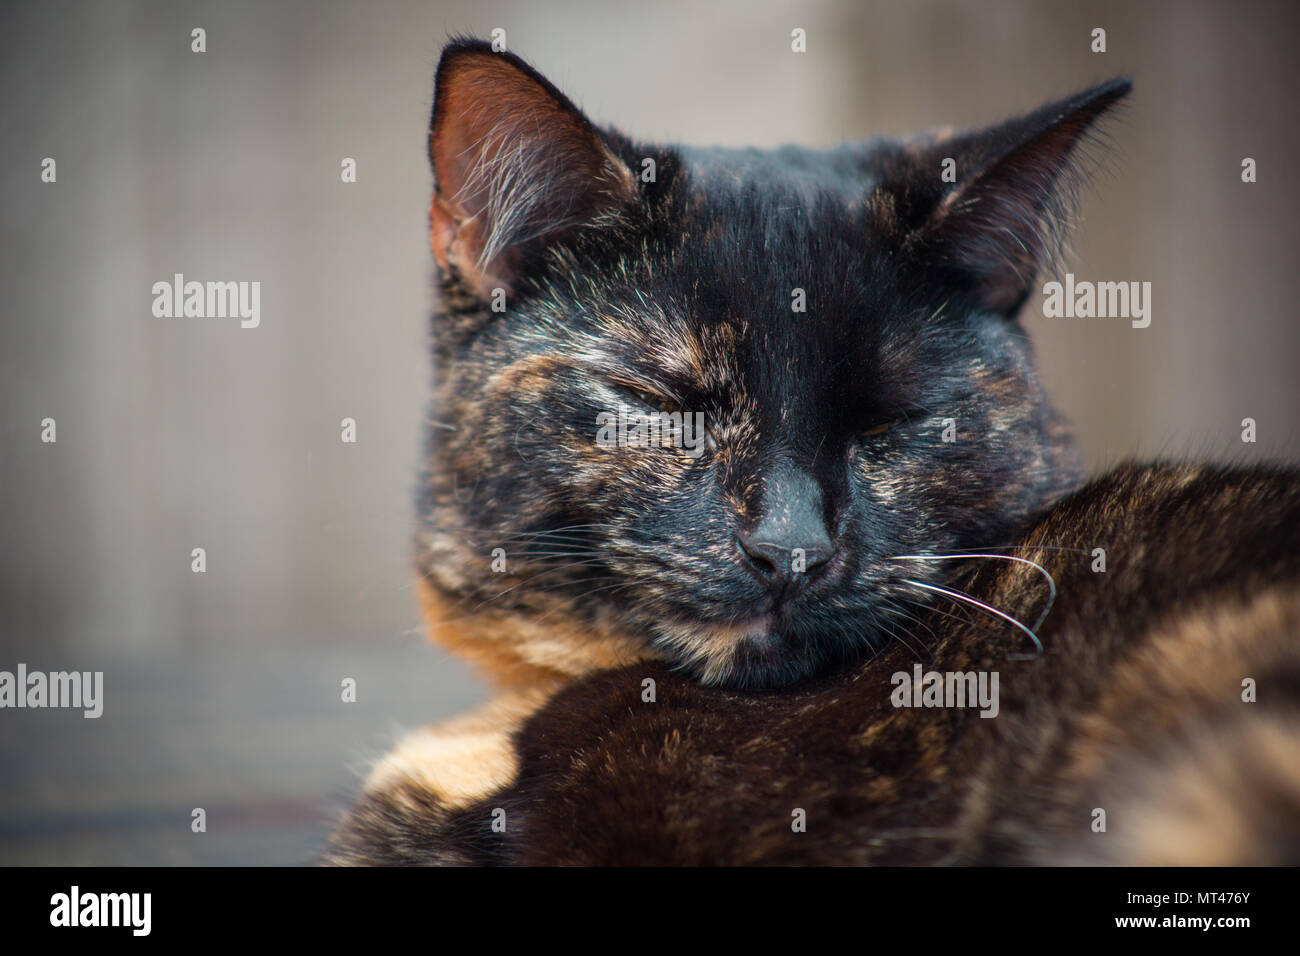 cute tortoiseshell cat enjoying herself outdoors - Stock Image